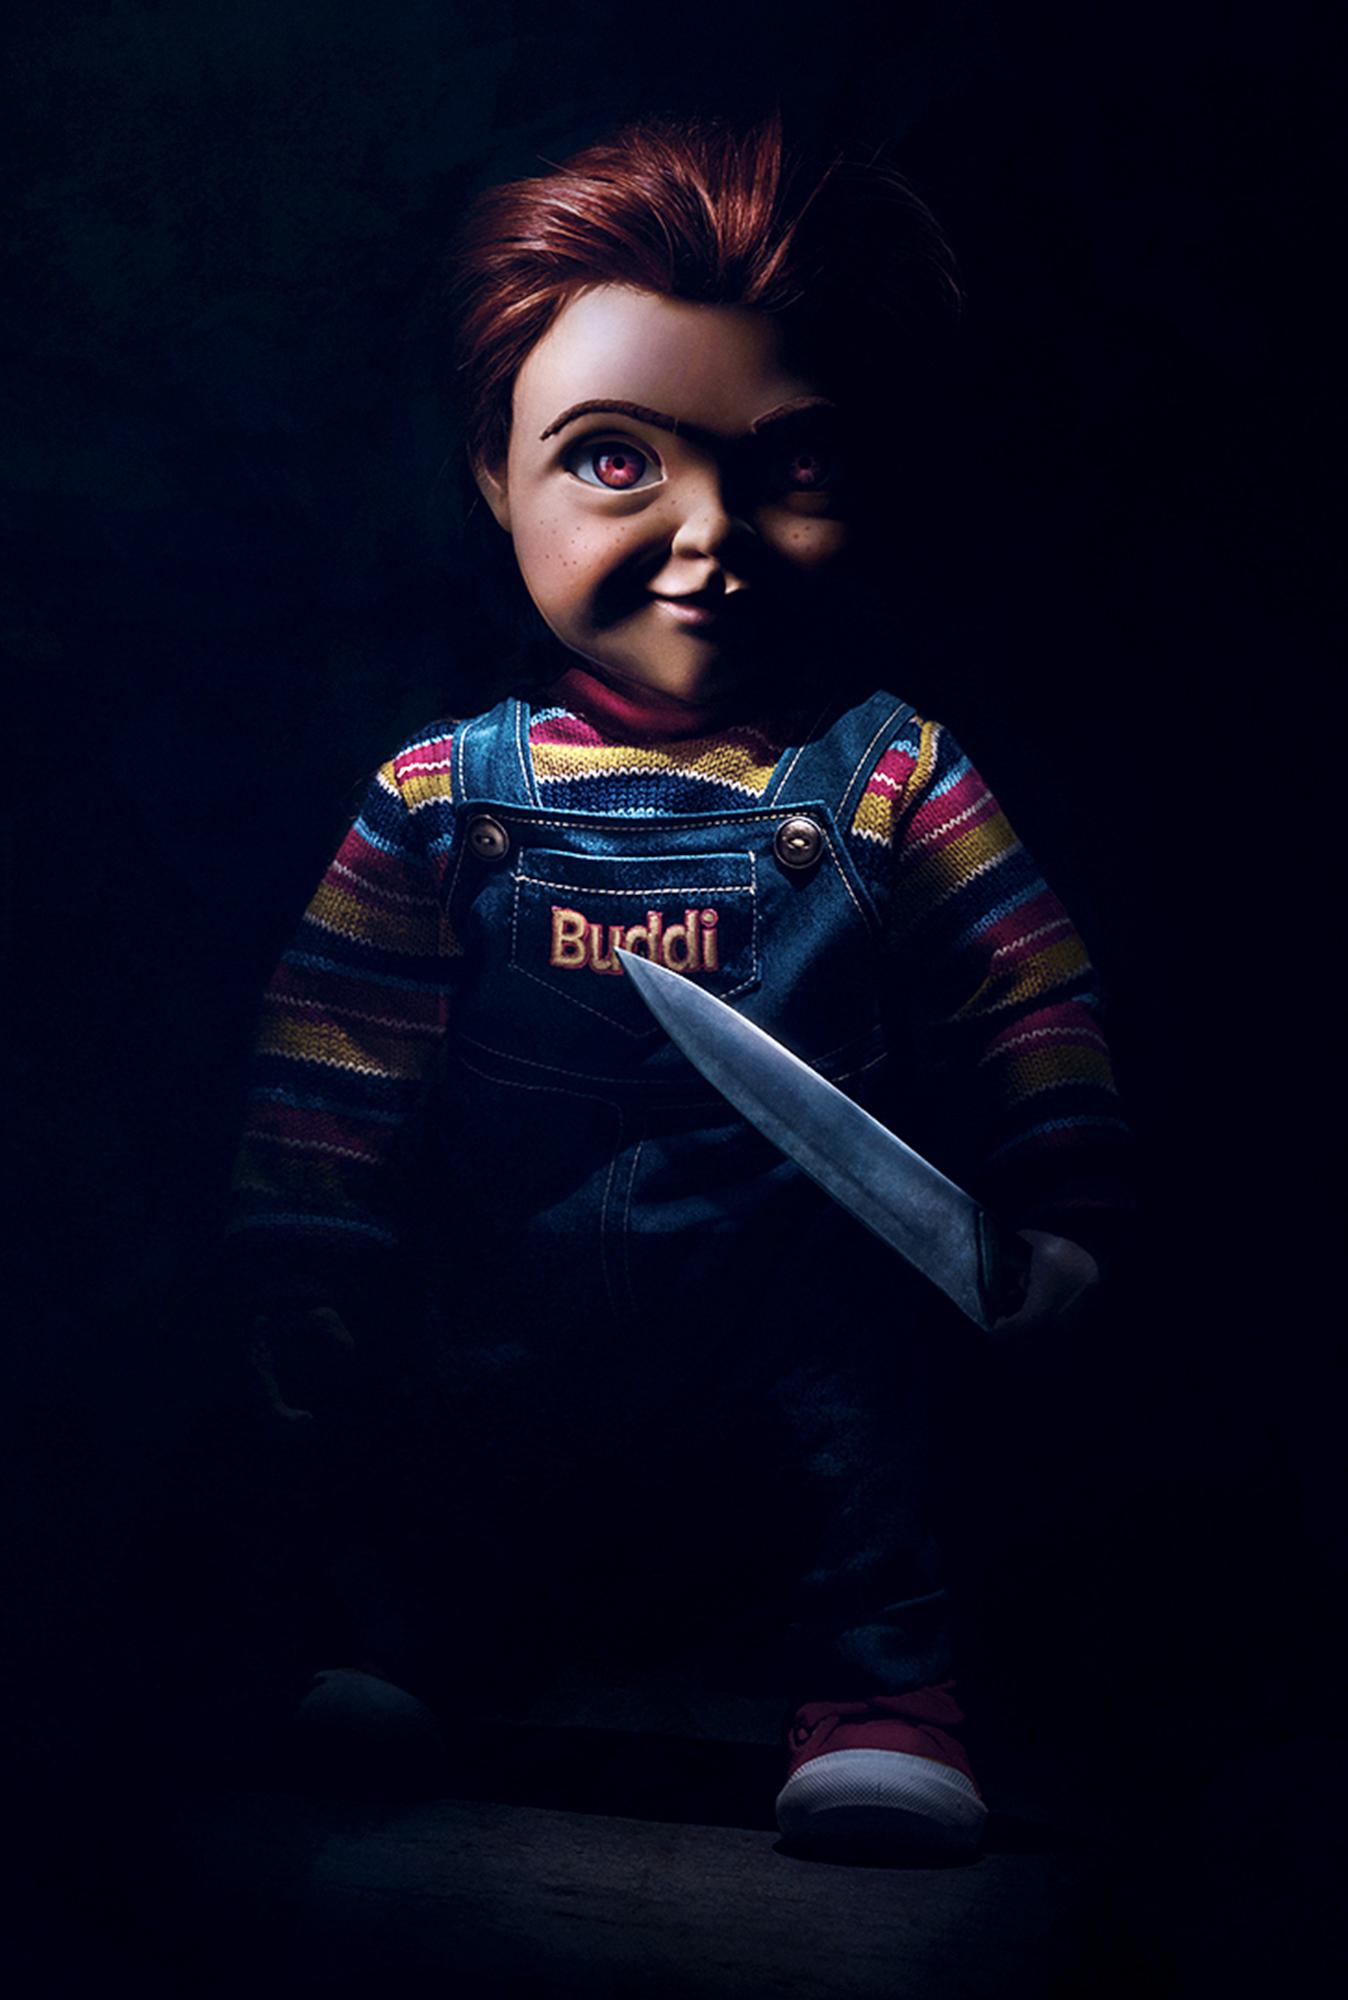 Chucky (Child's Play 2019)